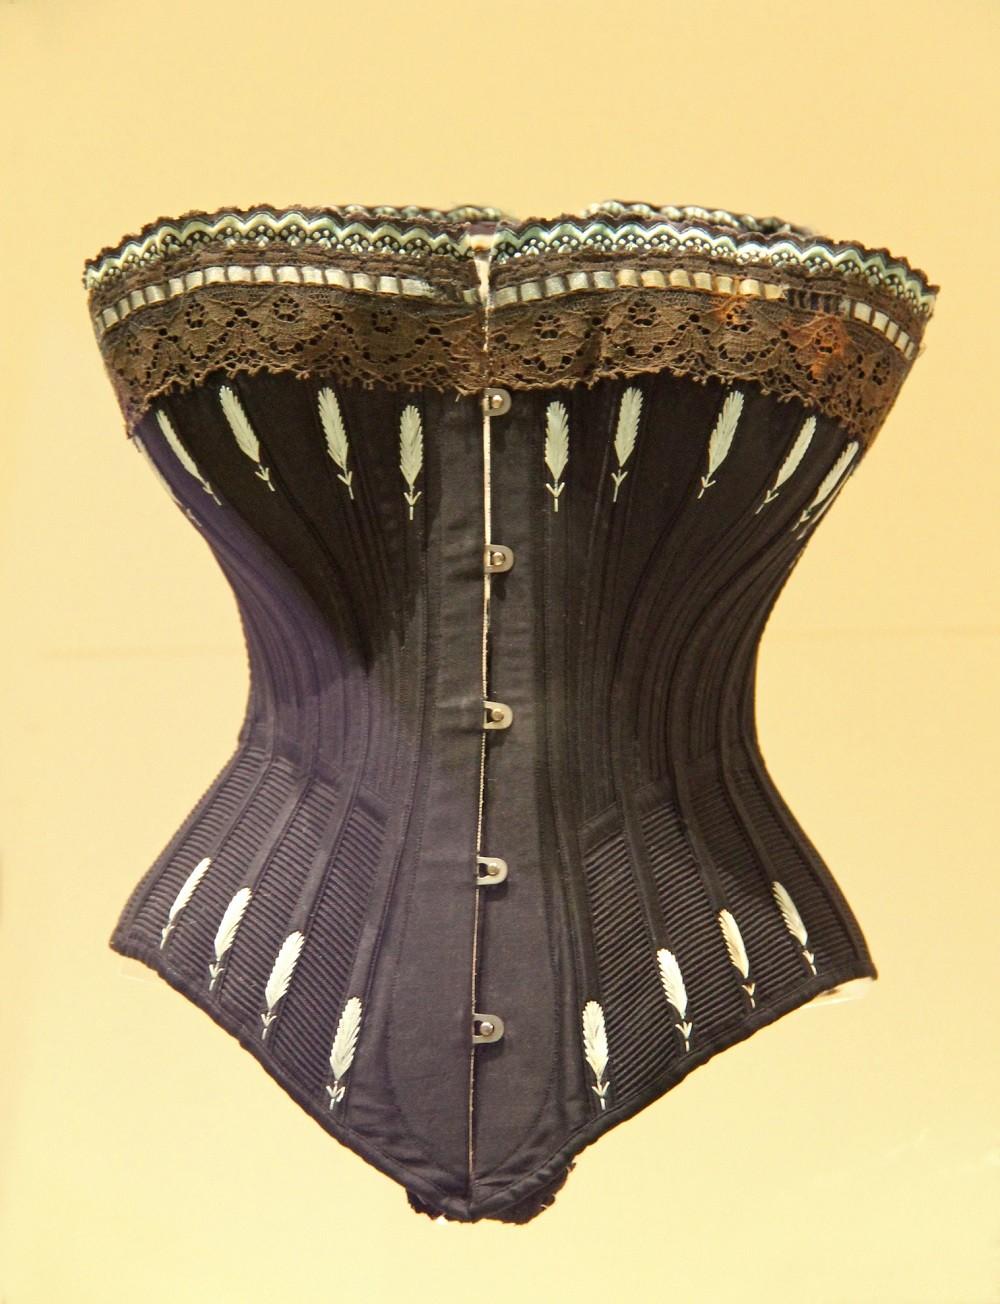 Vintage Ladies Support Corset